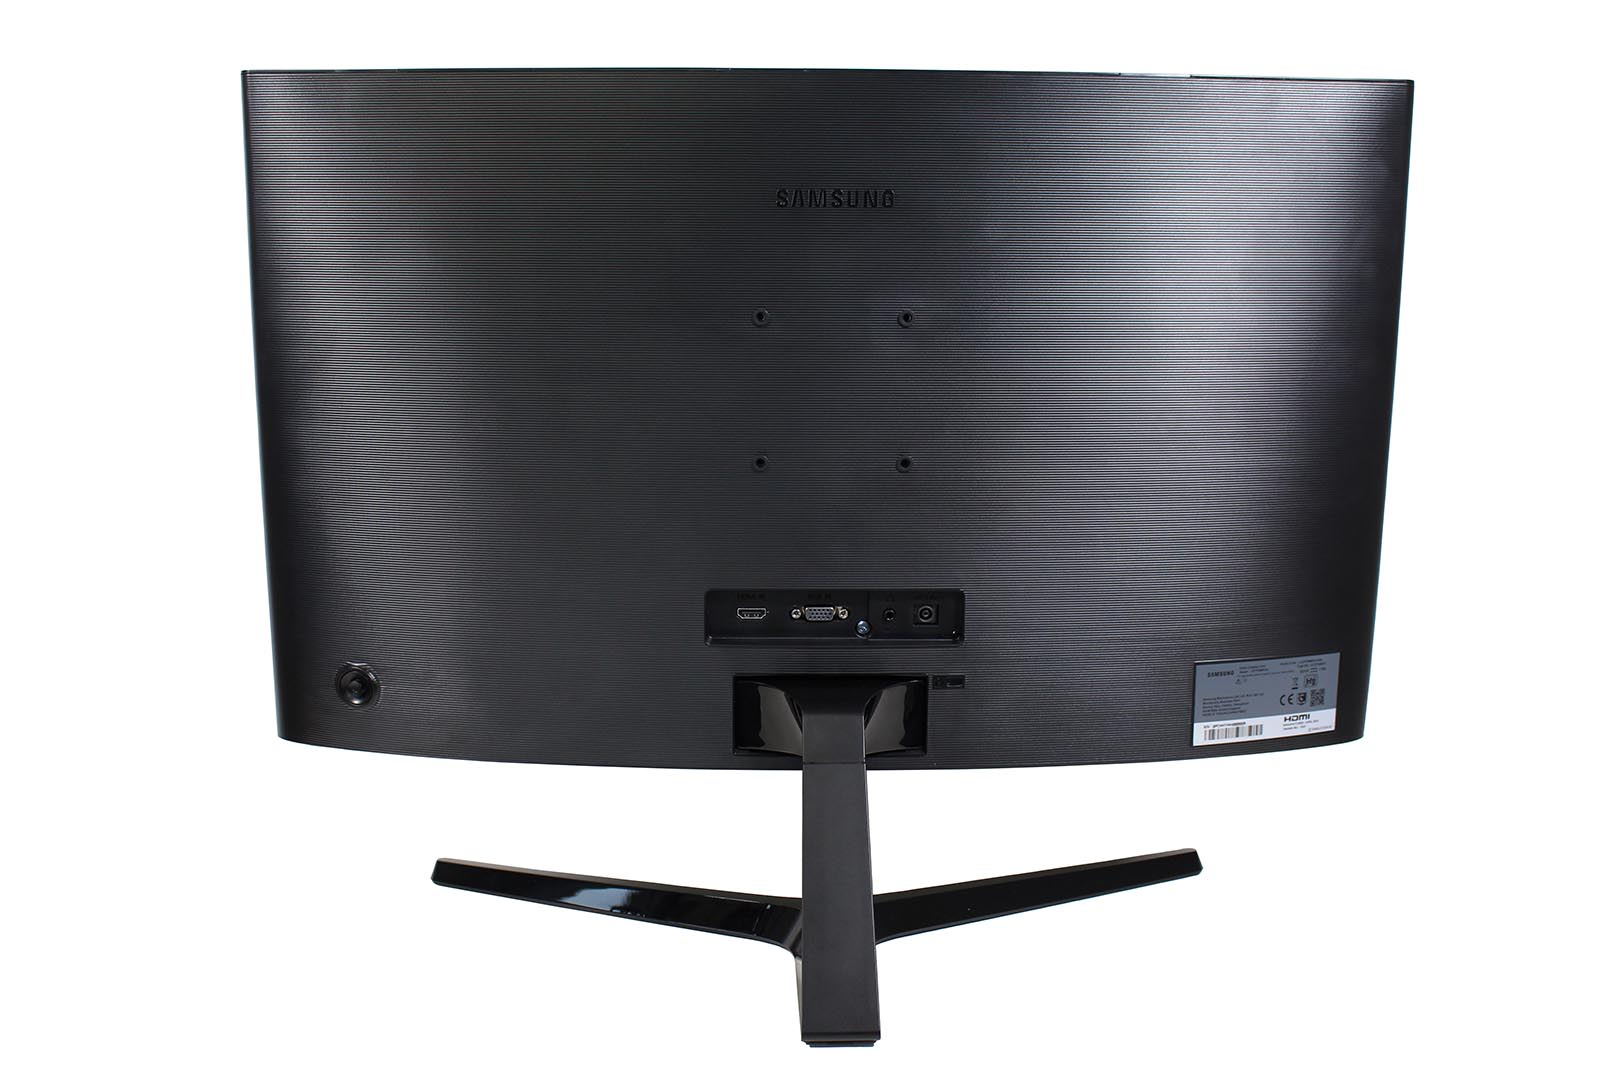 test samsung c27f396f curved monitor allround. Black Bedroom Furniture Sets. Home Design Ideas